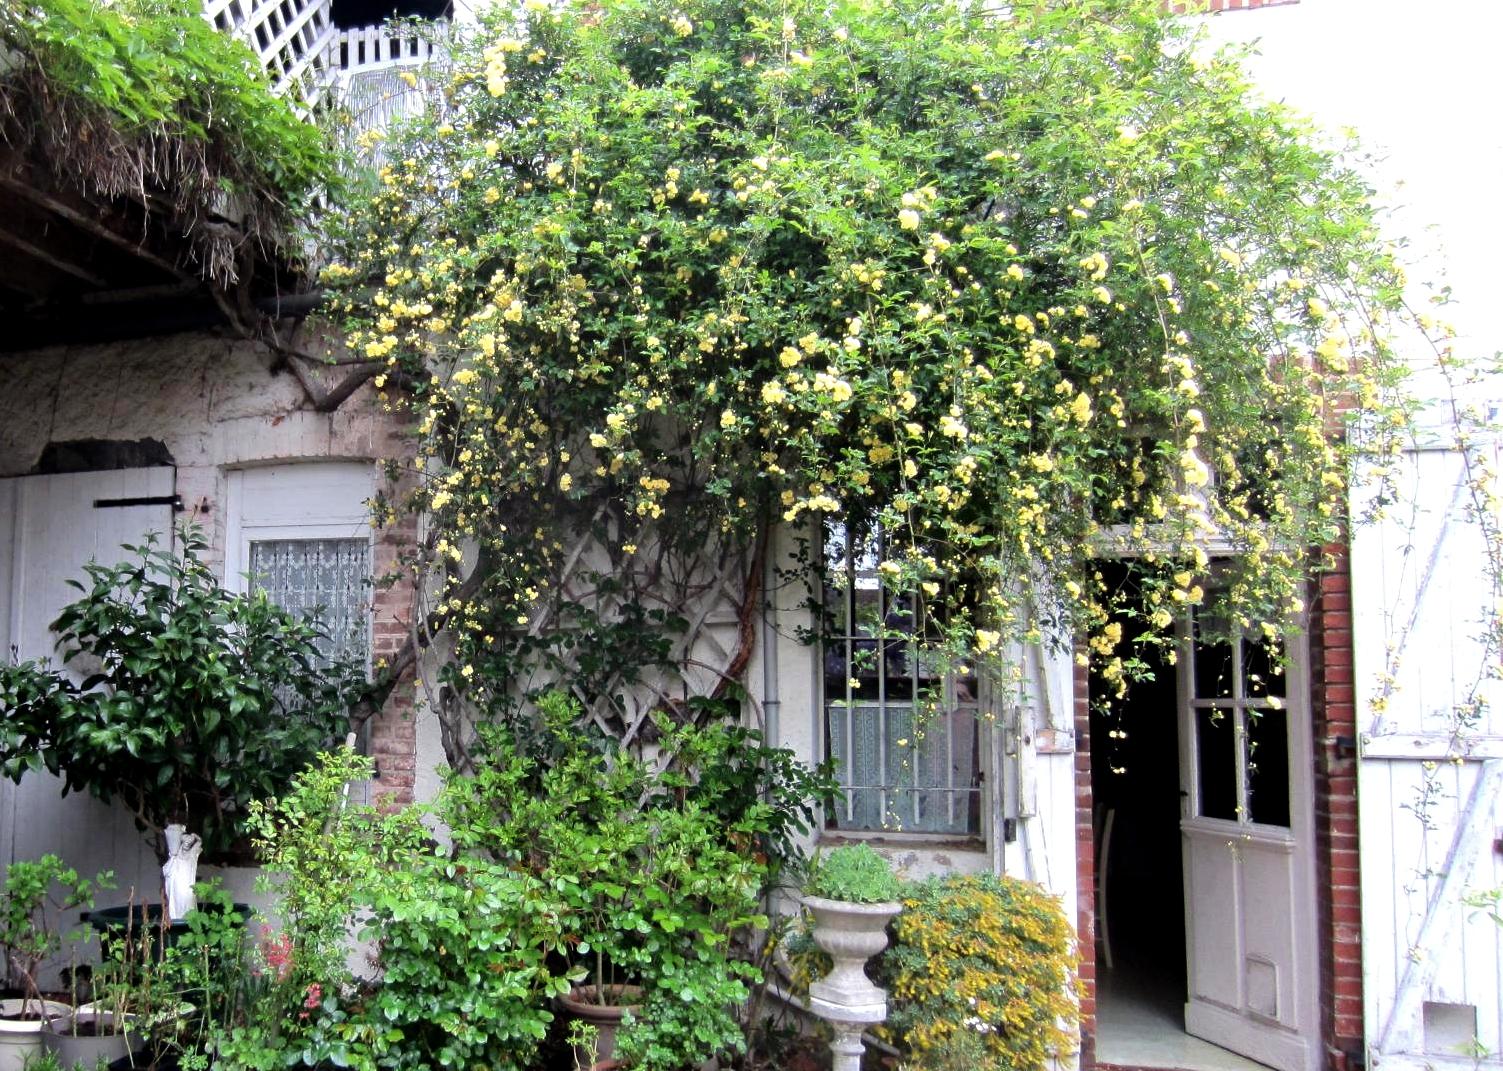 Mon Jardin En Avril matin lumineux: jardin de fin d'avril